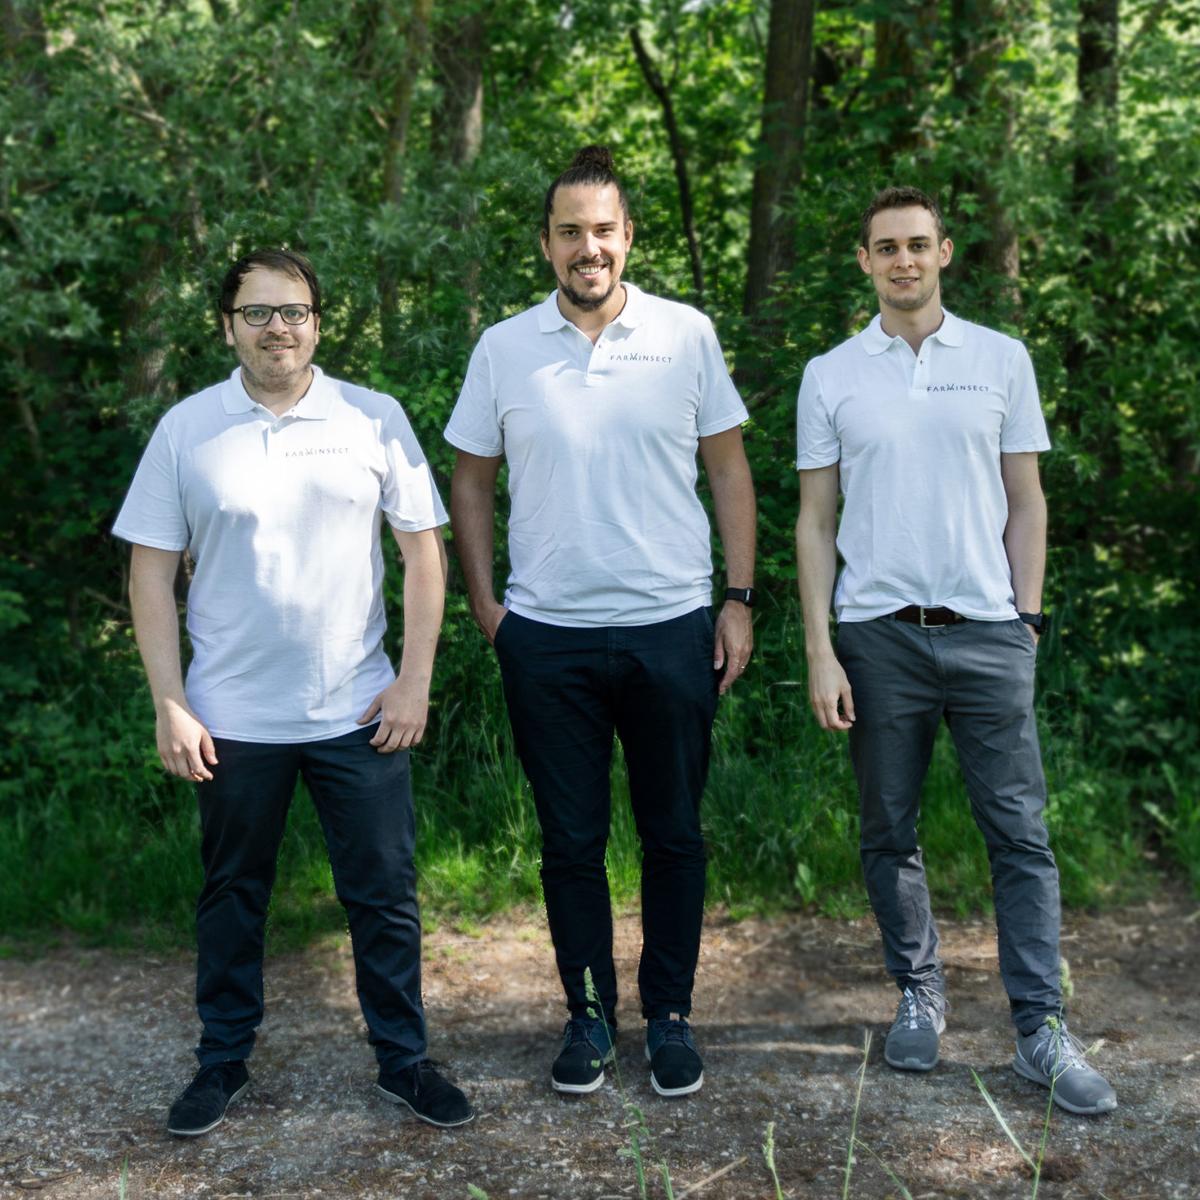 Das Gründer-Team von FarmInsect: Wolfgang Westermeier, Thomas Kühn und Andre Klöckner